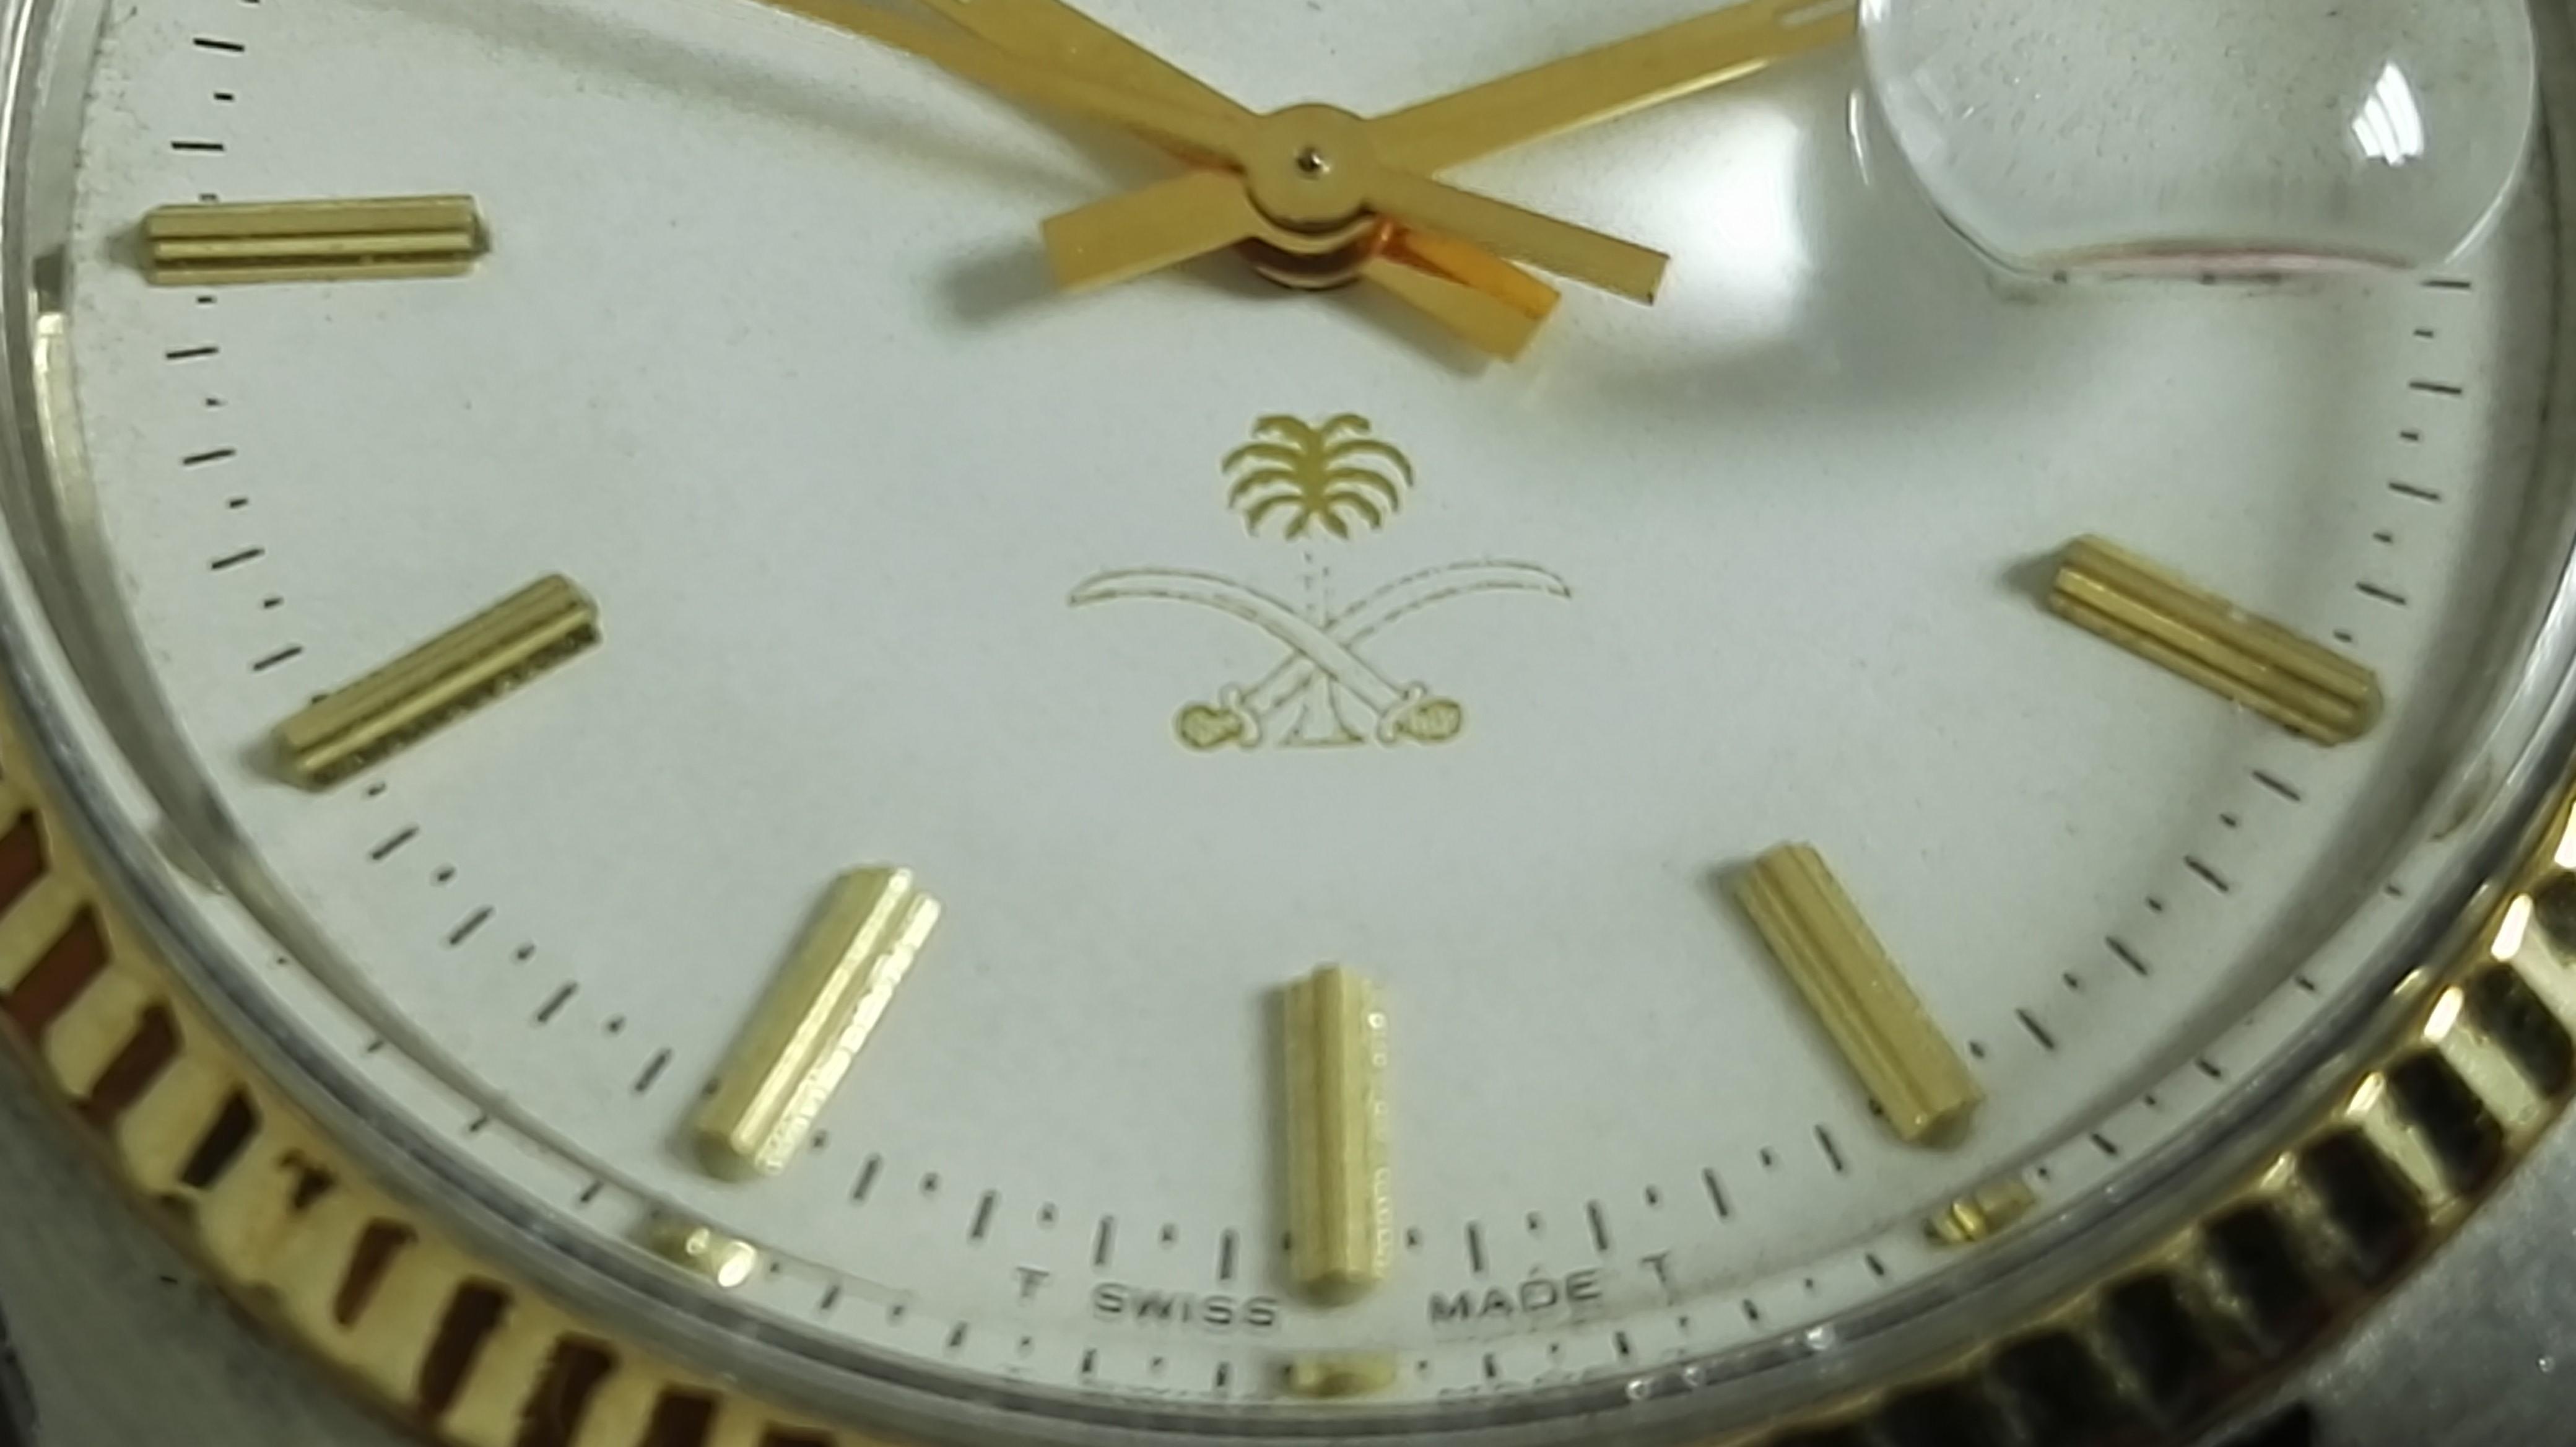 Rolex Datejust Rare Datejust Saudi Crest  16013 steel and 18 kt gold   San Giorgio a Cremano